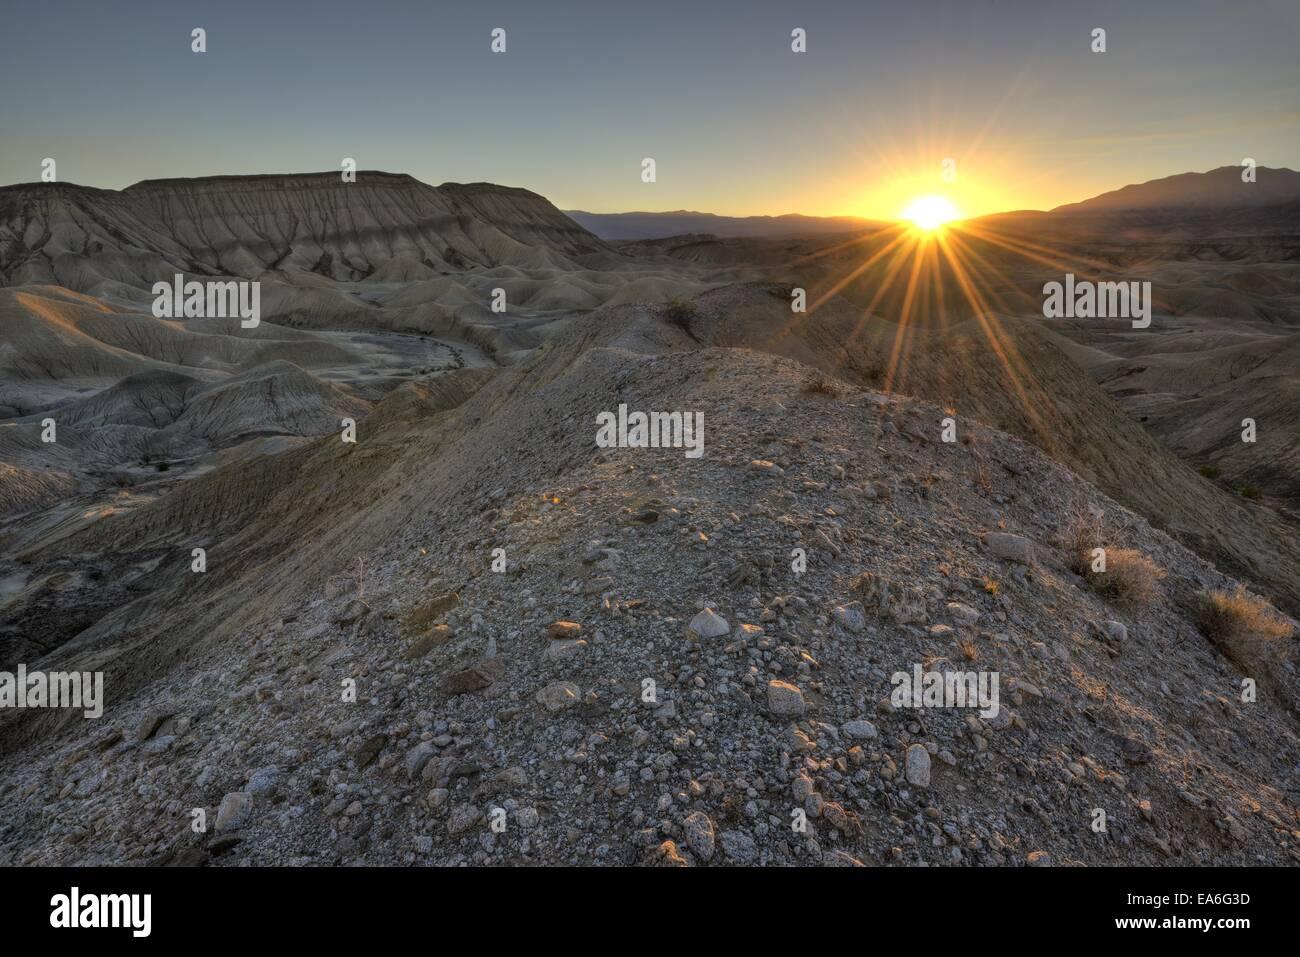 USA, California, Anza-Borrego Desert State Park, Fish Creek Mountain Area, Sunset in Desert - Stock Image